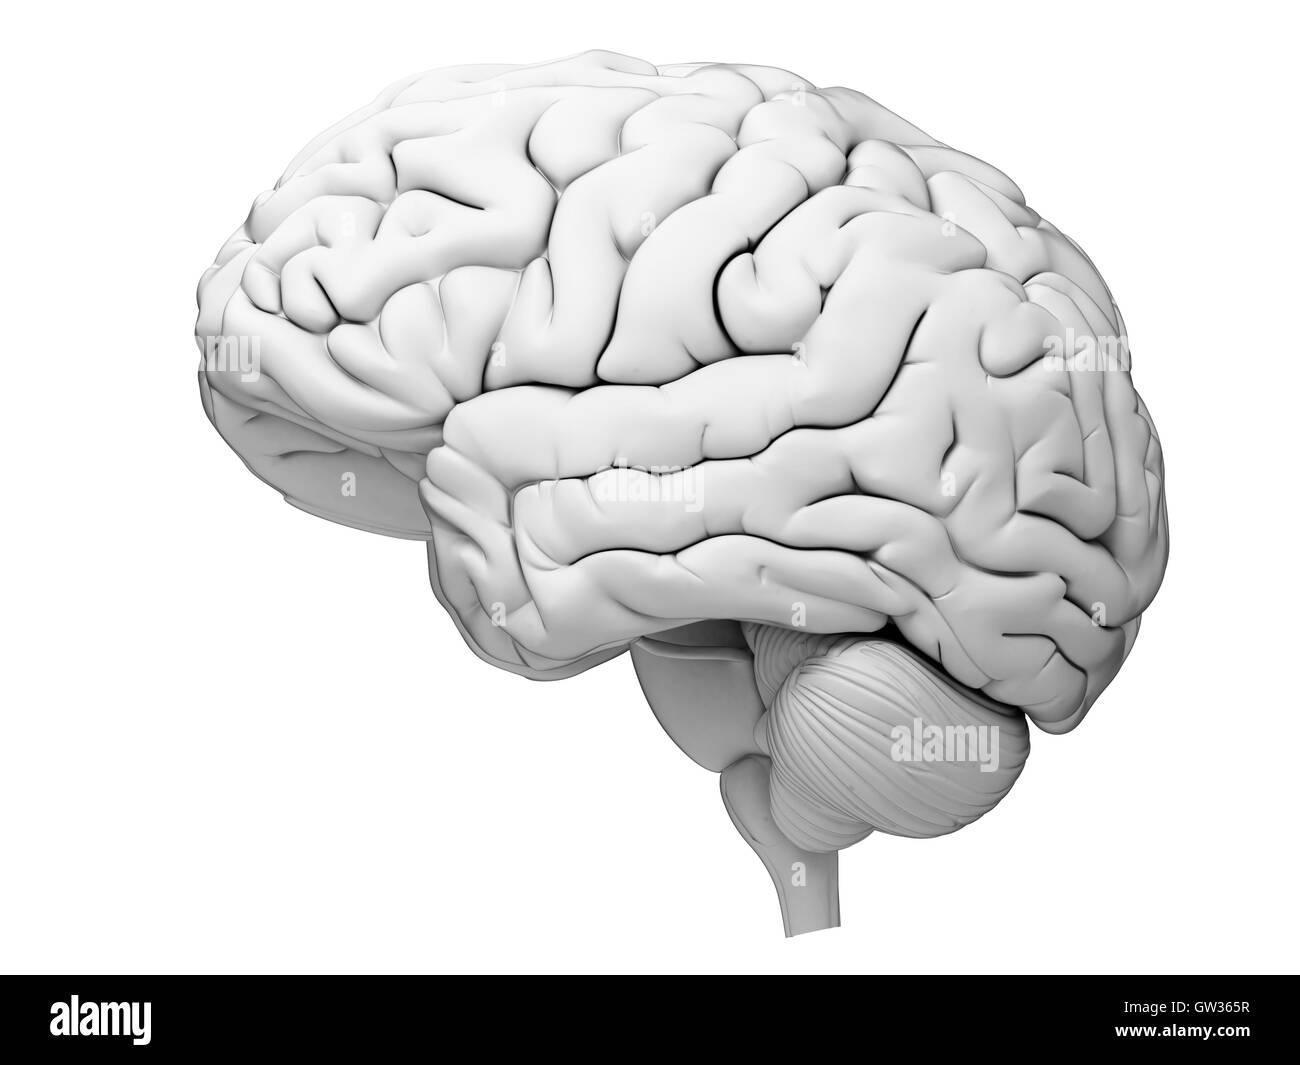 Human brain, illustration. - Stock Image